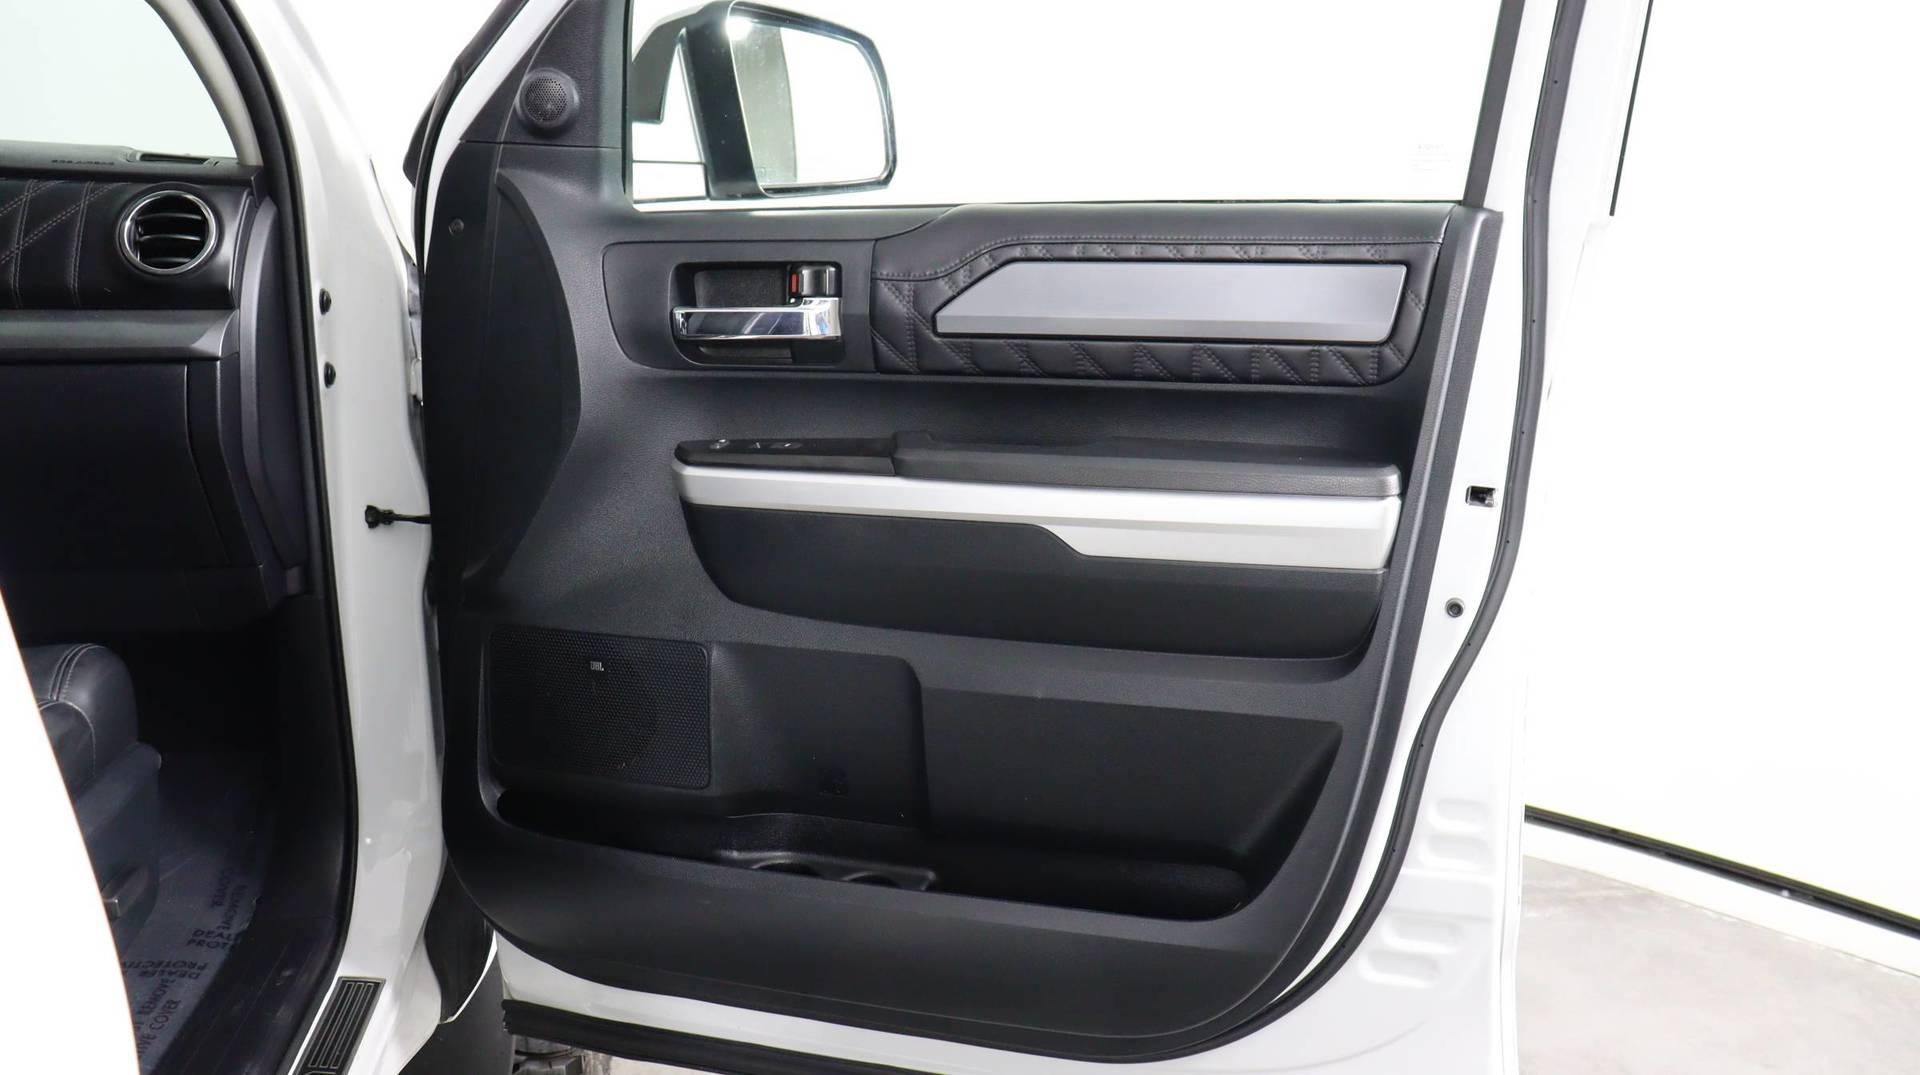 Carvix - Used vehicle - Truck TOYOTA TUNDRA 4WD 2017